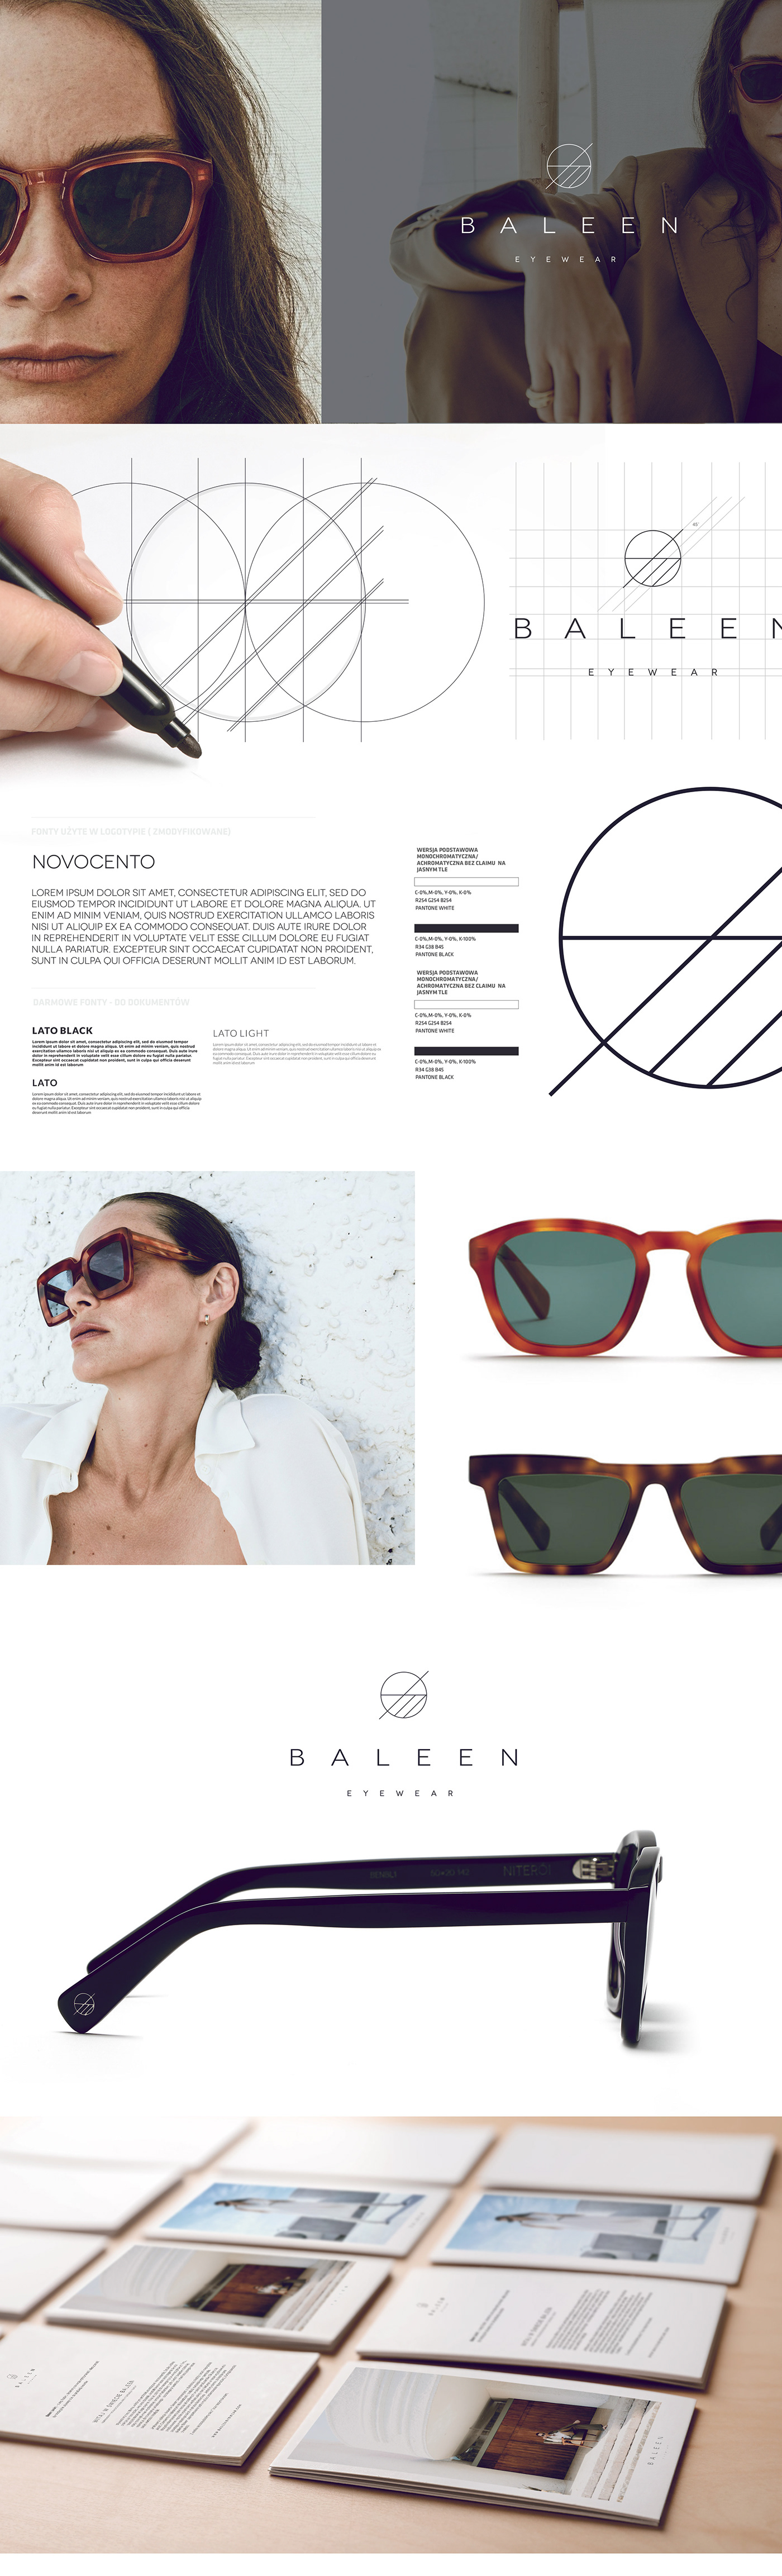 eye Fashion Models glasses summer Sunglasses